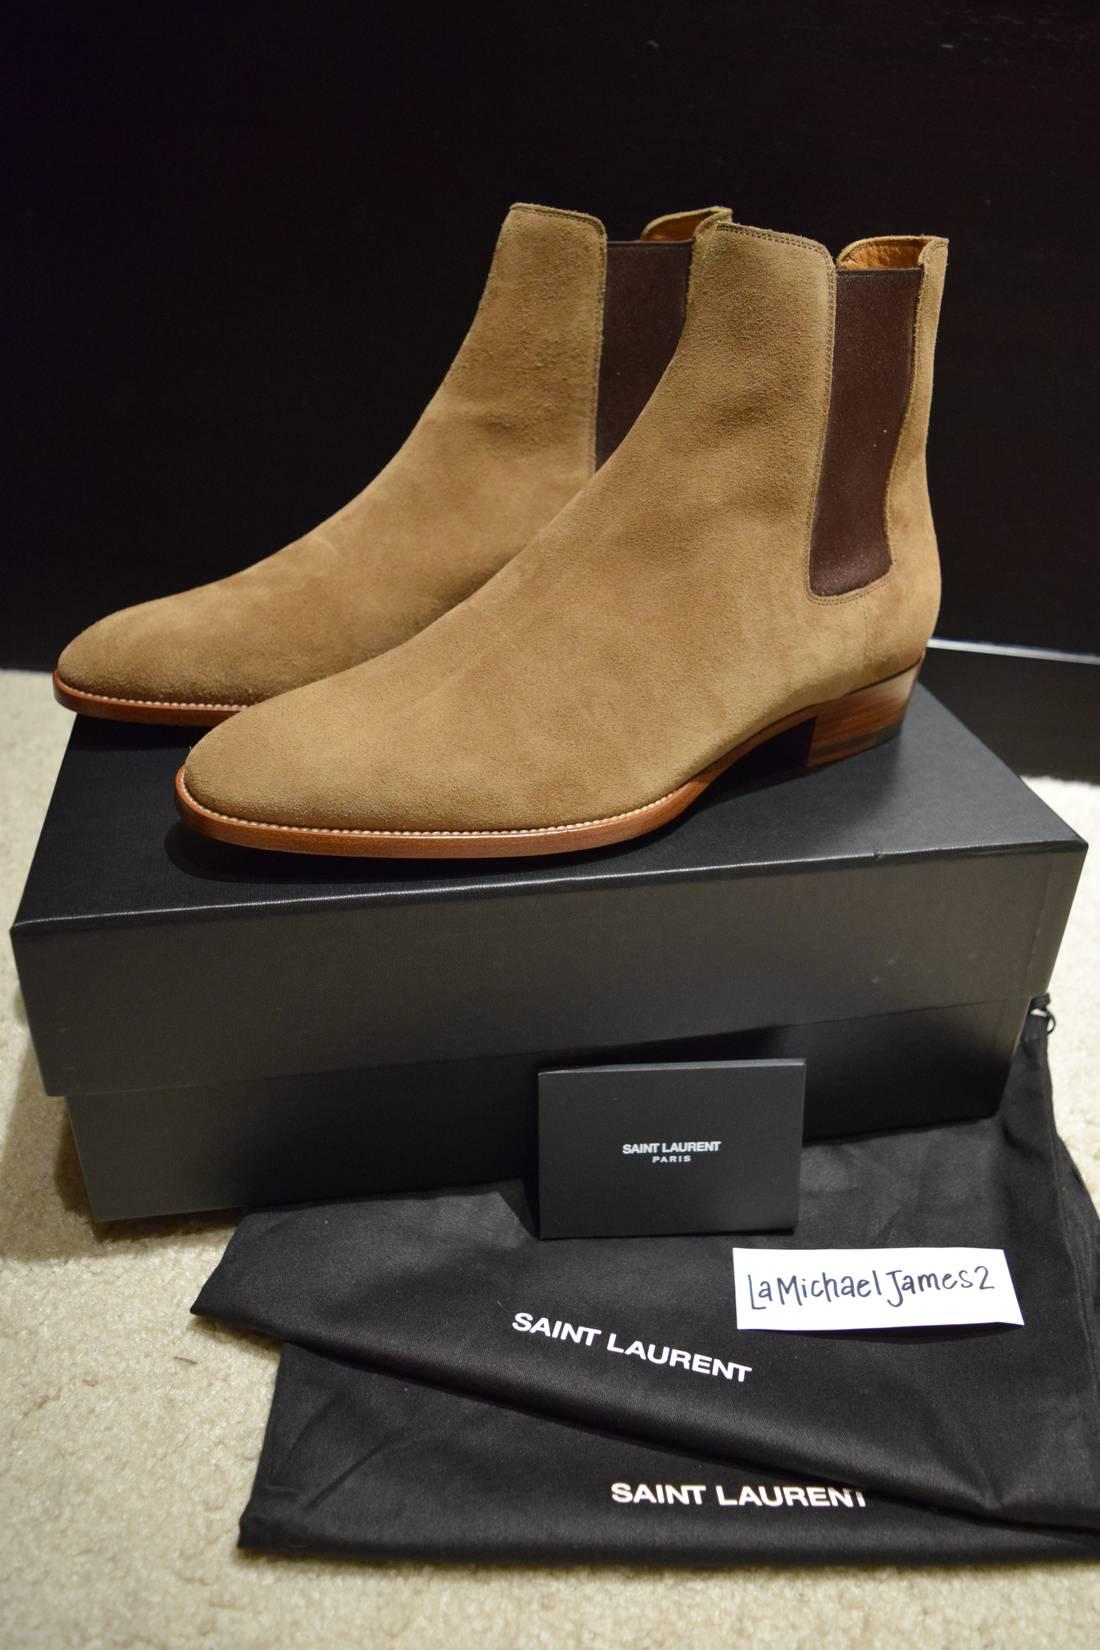 6032bffec06 ... store yves saint laurent wyatt 30 chelsea boots in new sigaro size us 9  eu 42